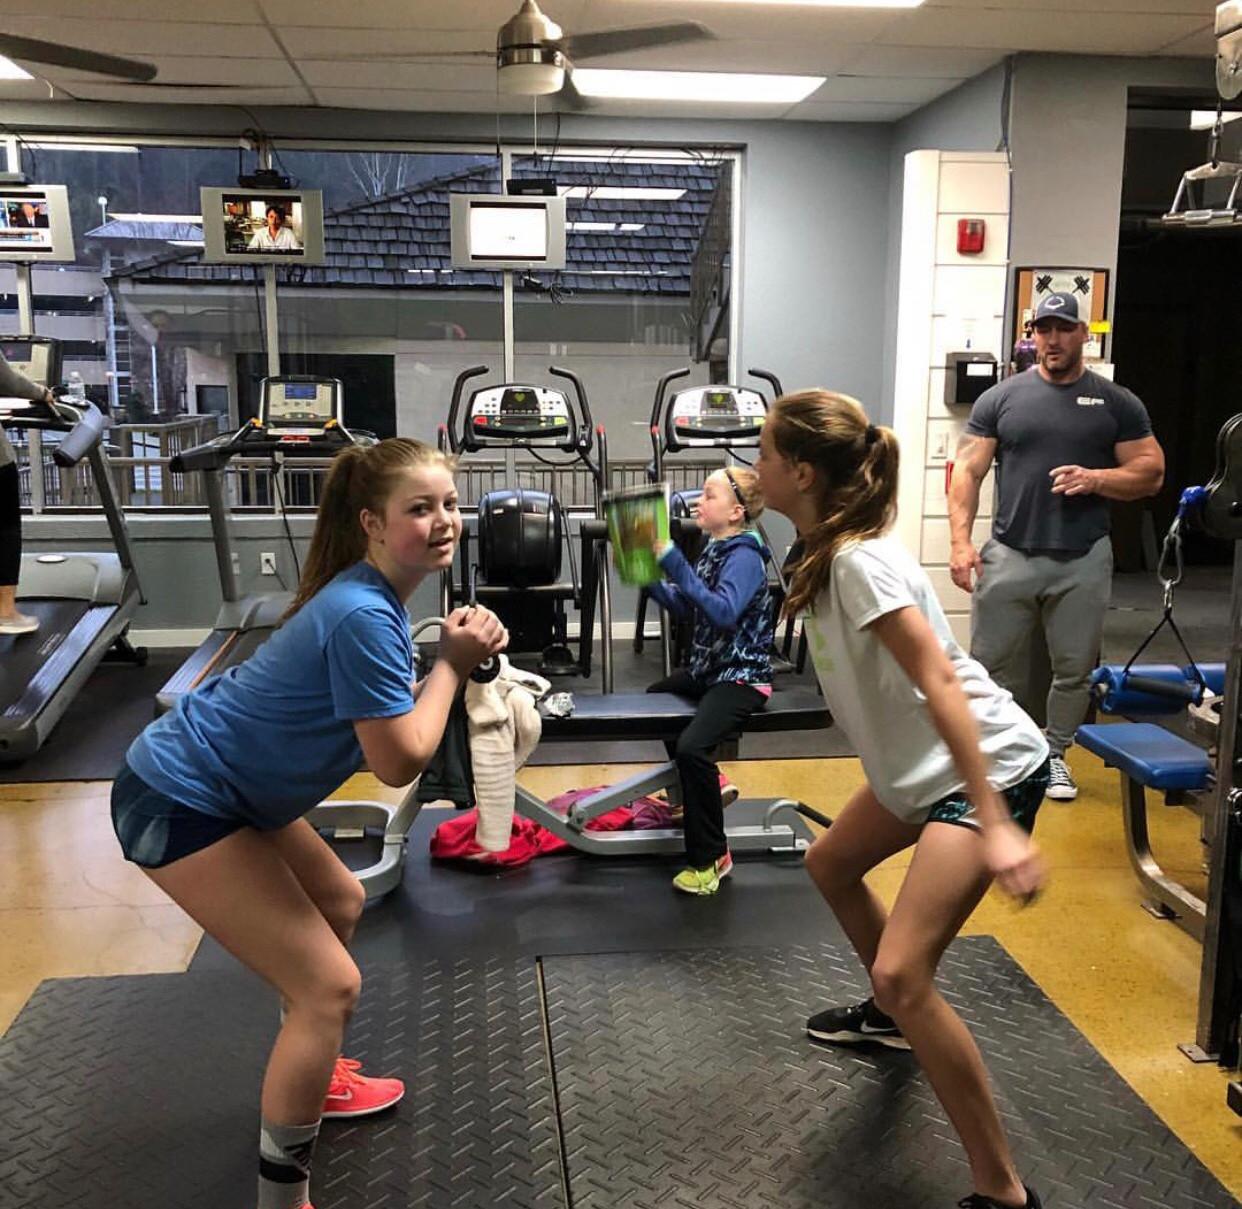 Elite Fitness & Personal Training Gatlinburg